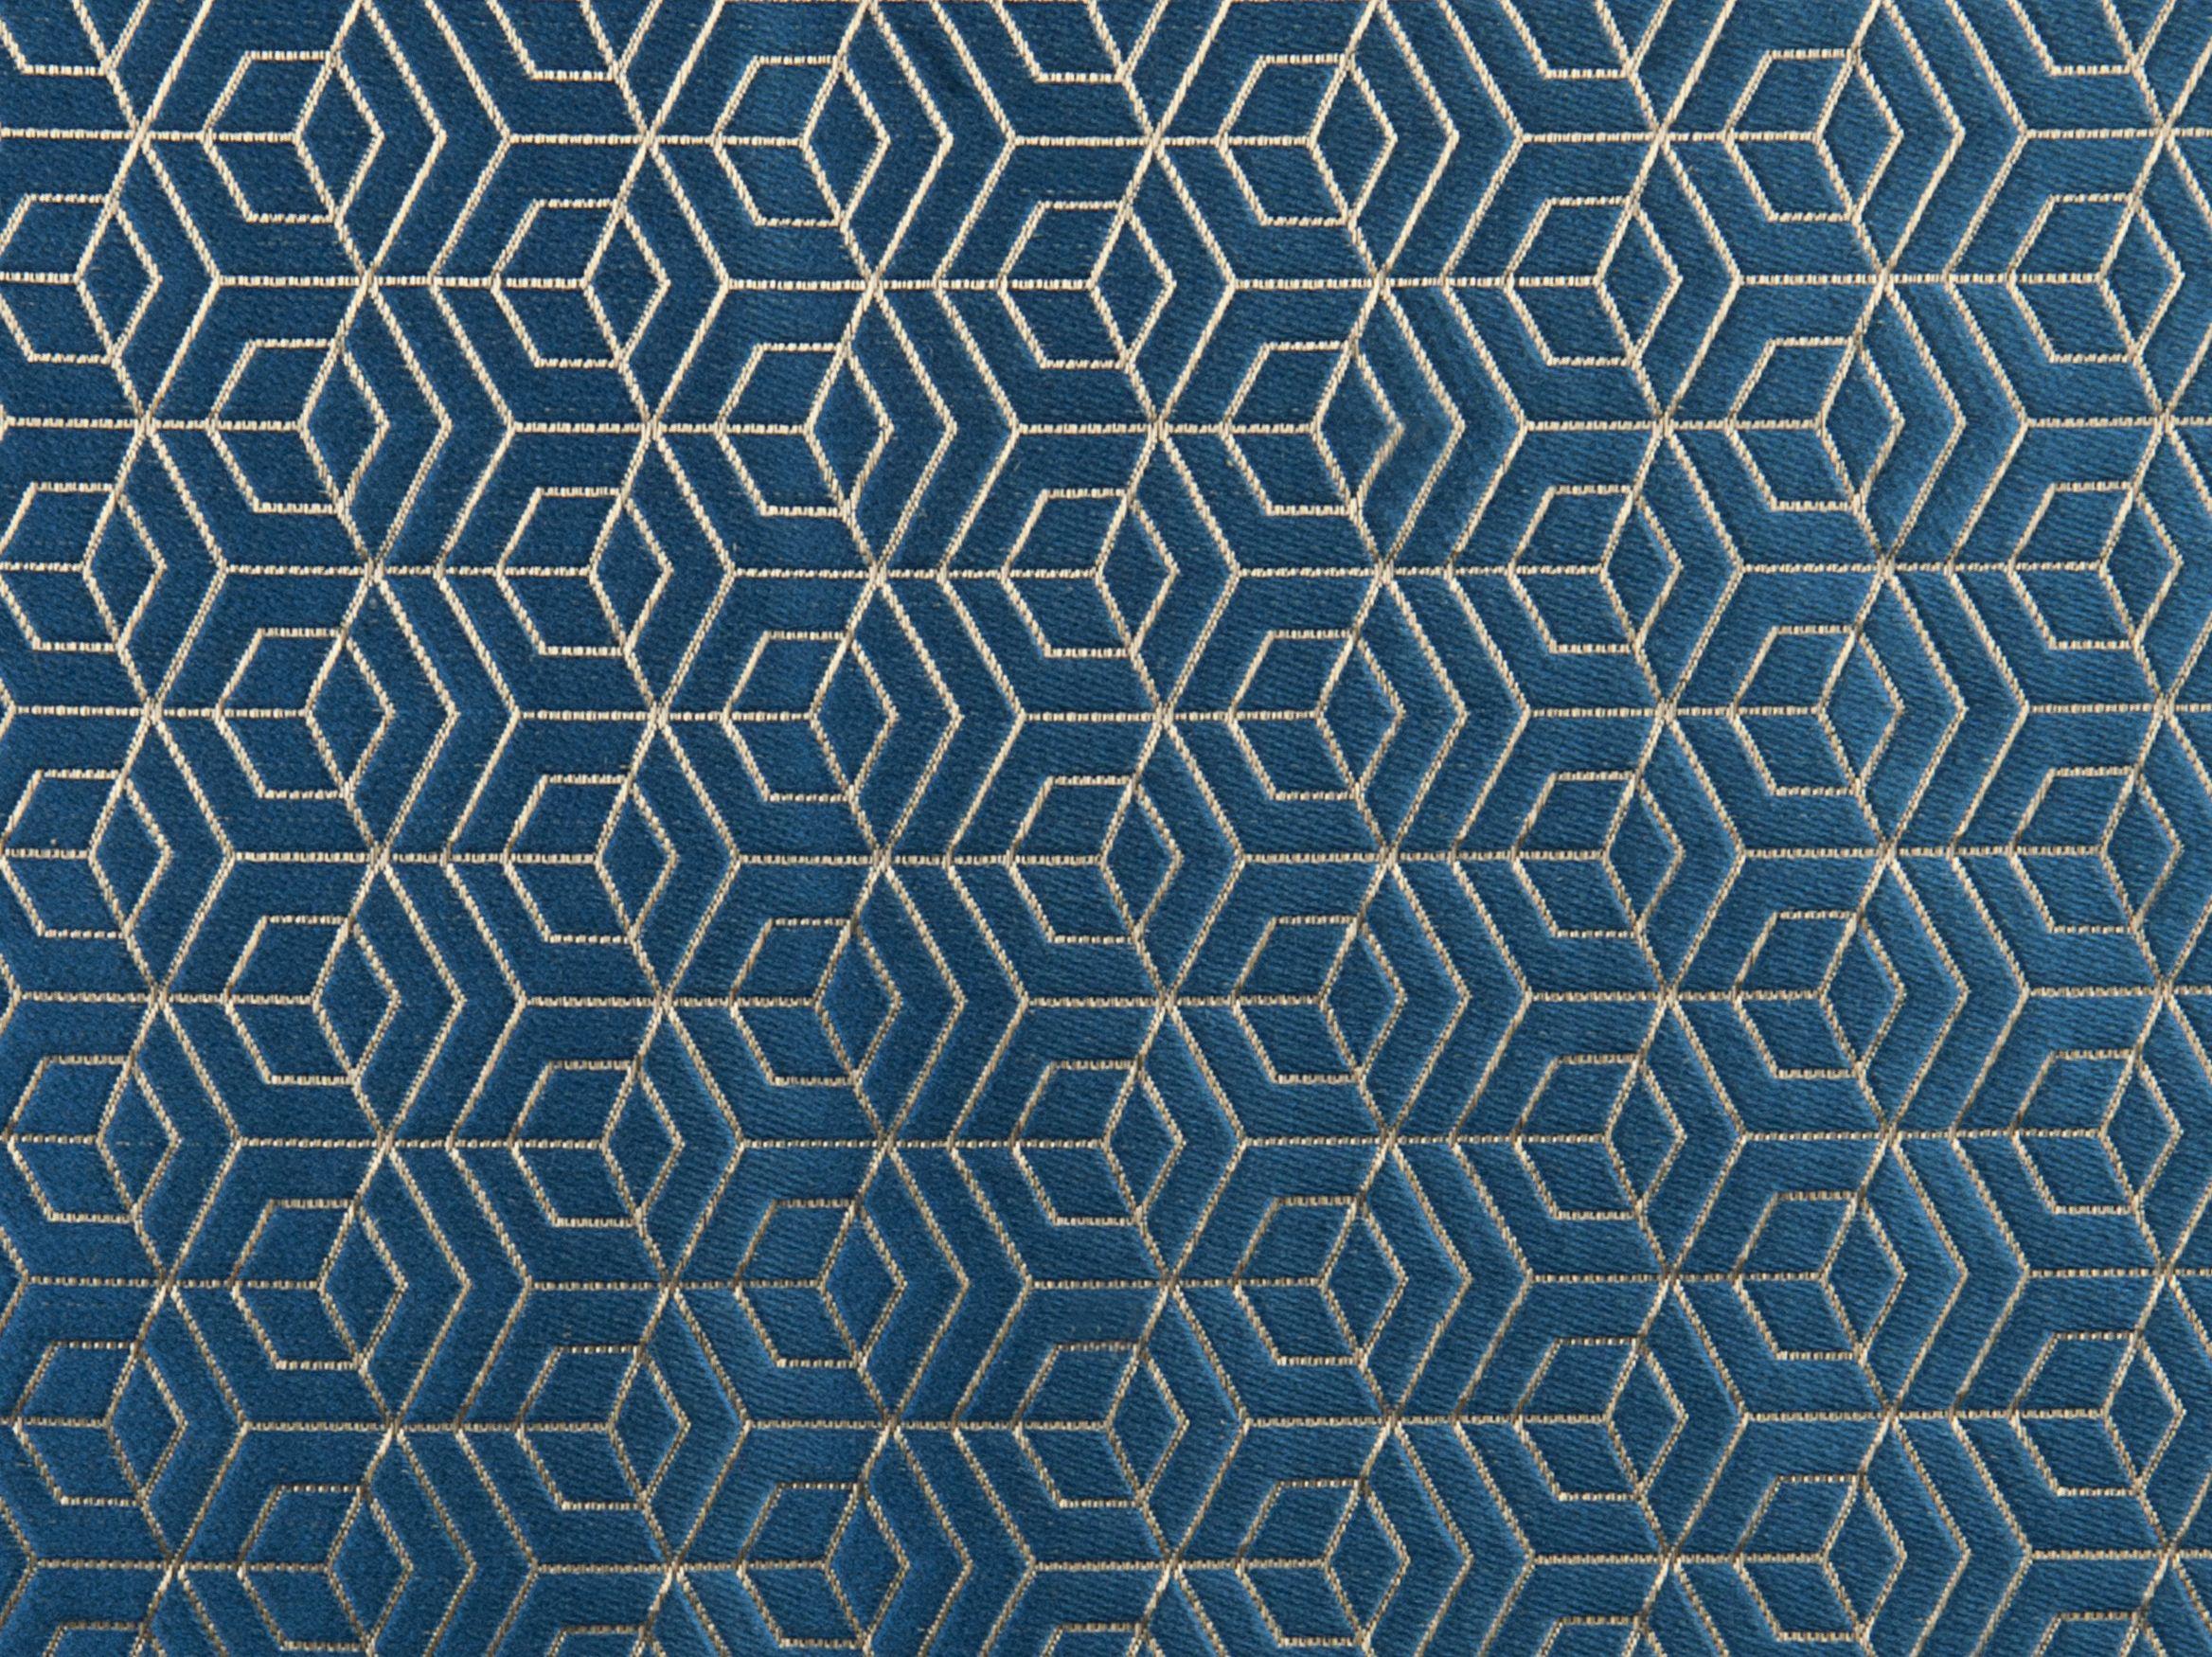 Tissu d 39 ameublement motifs graphiques hoopstar by aldeco for Tissu d ameublement design